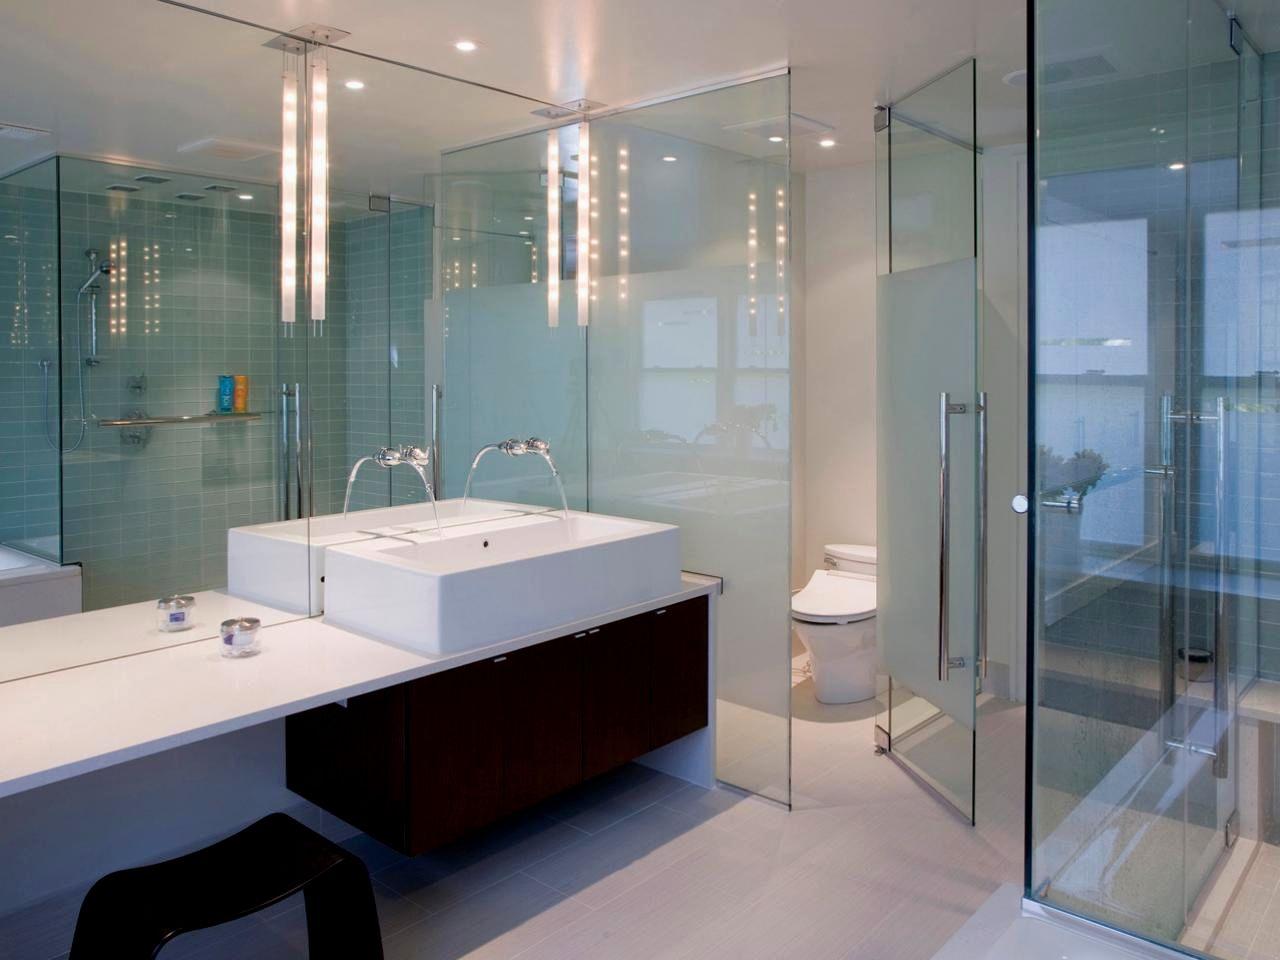 top jack and jill bathroom inspiration-Amazing Jack and Jill Bathroom Online